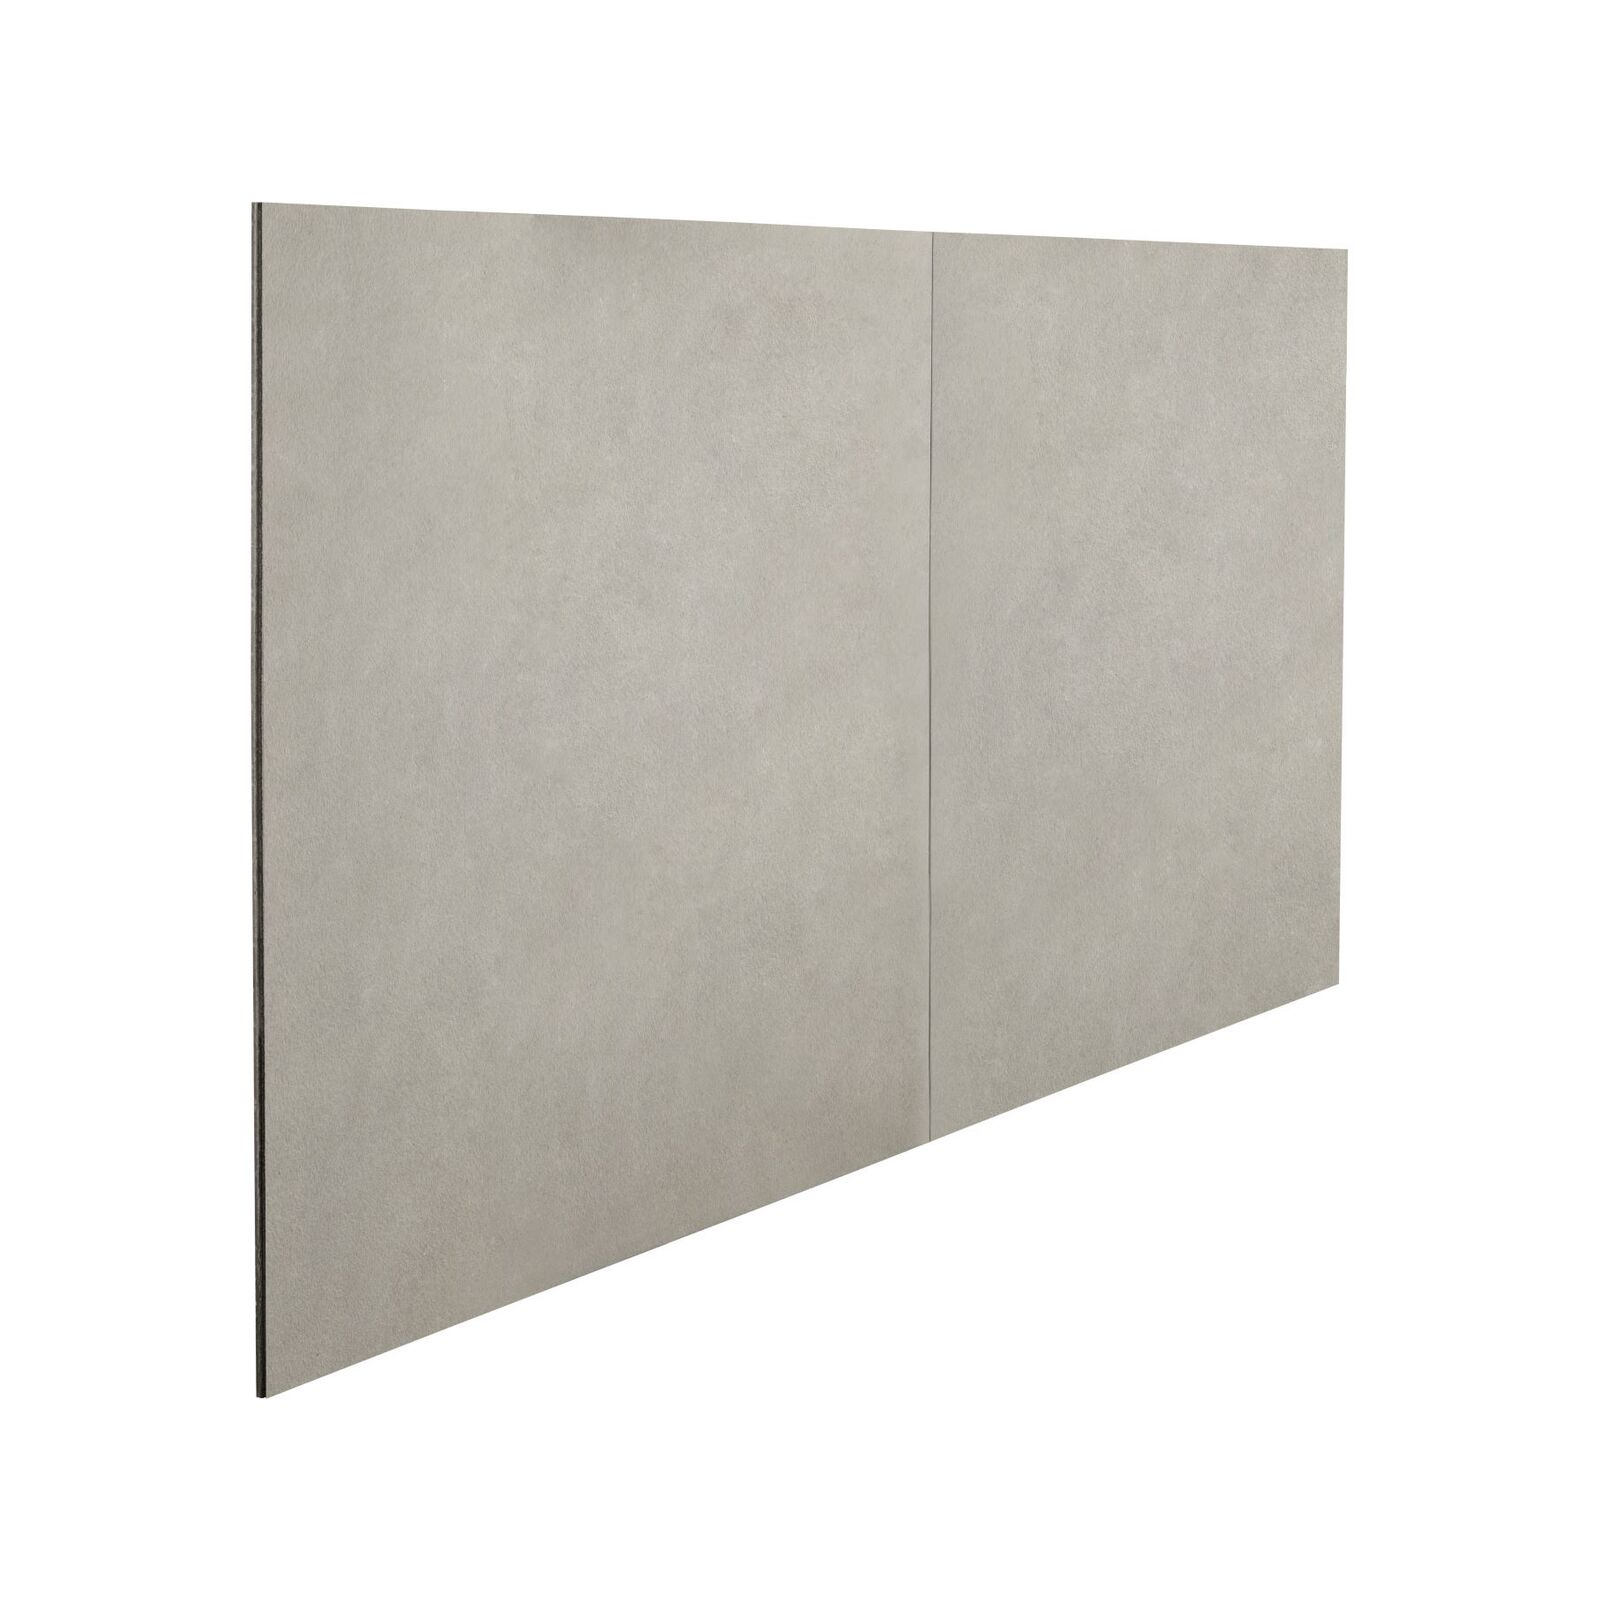 James Hardie 3000 x 1200 x 8.5mm Hardie Fine Texture Cladding